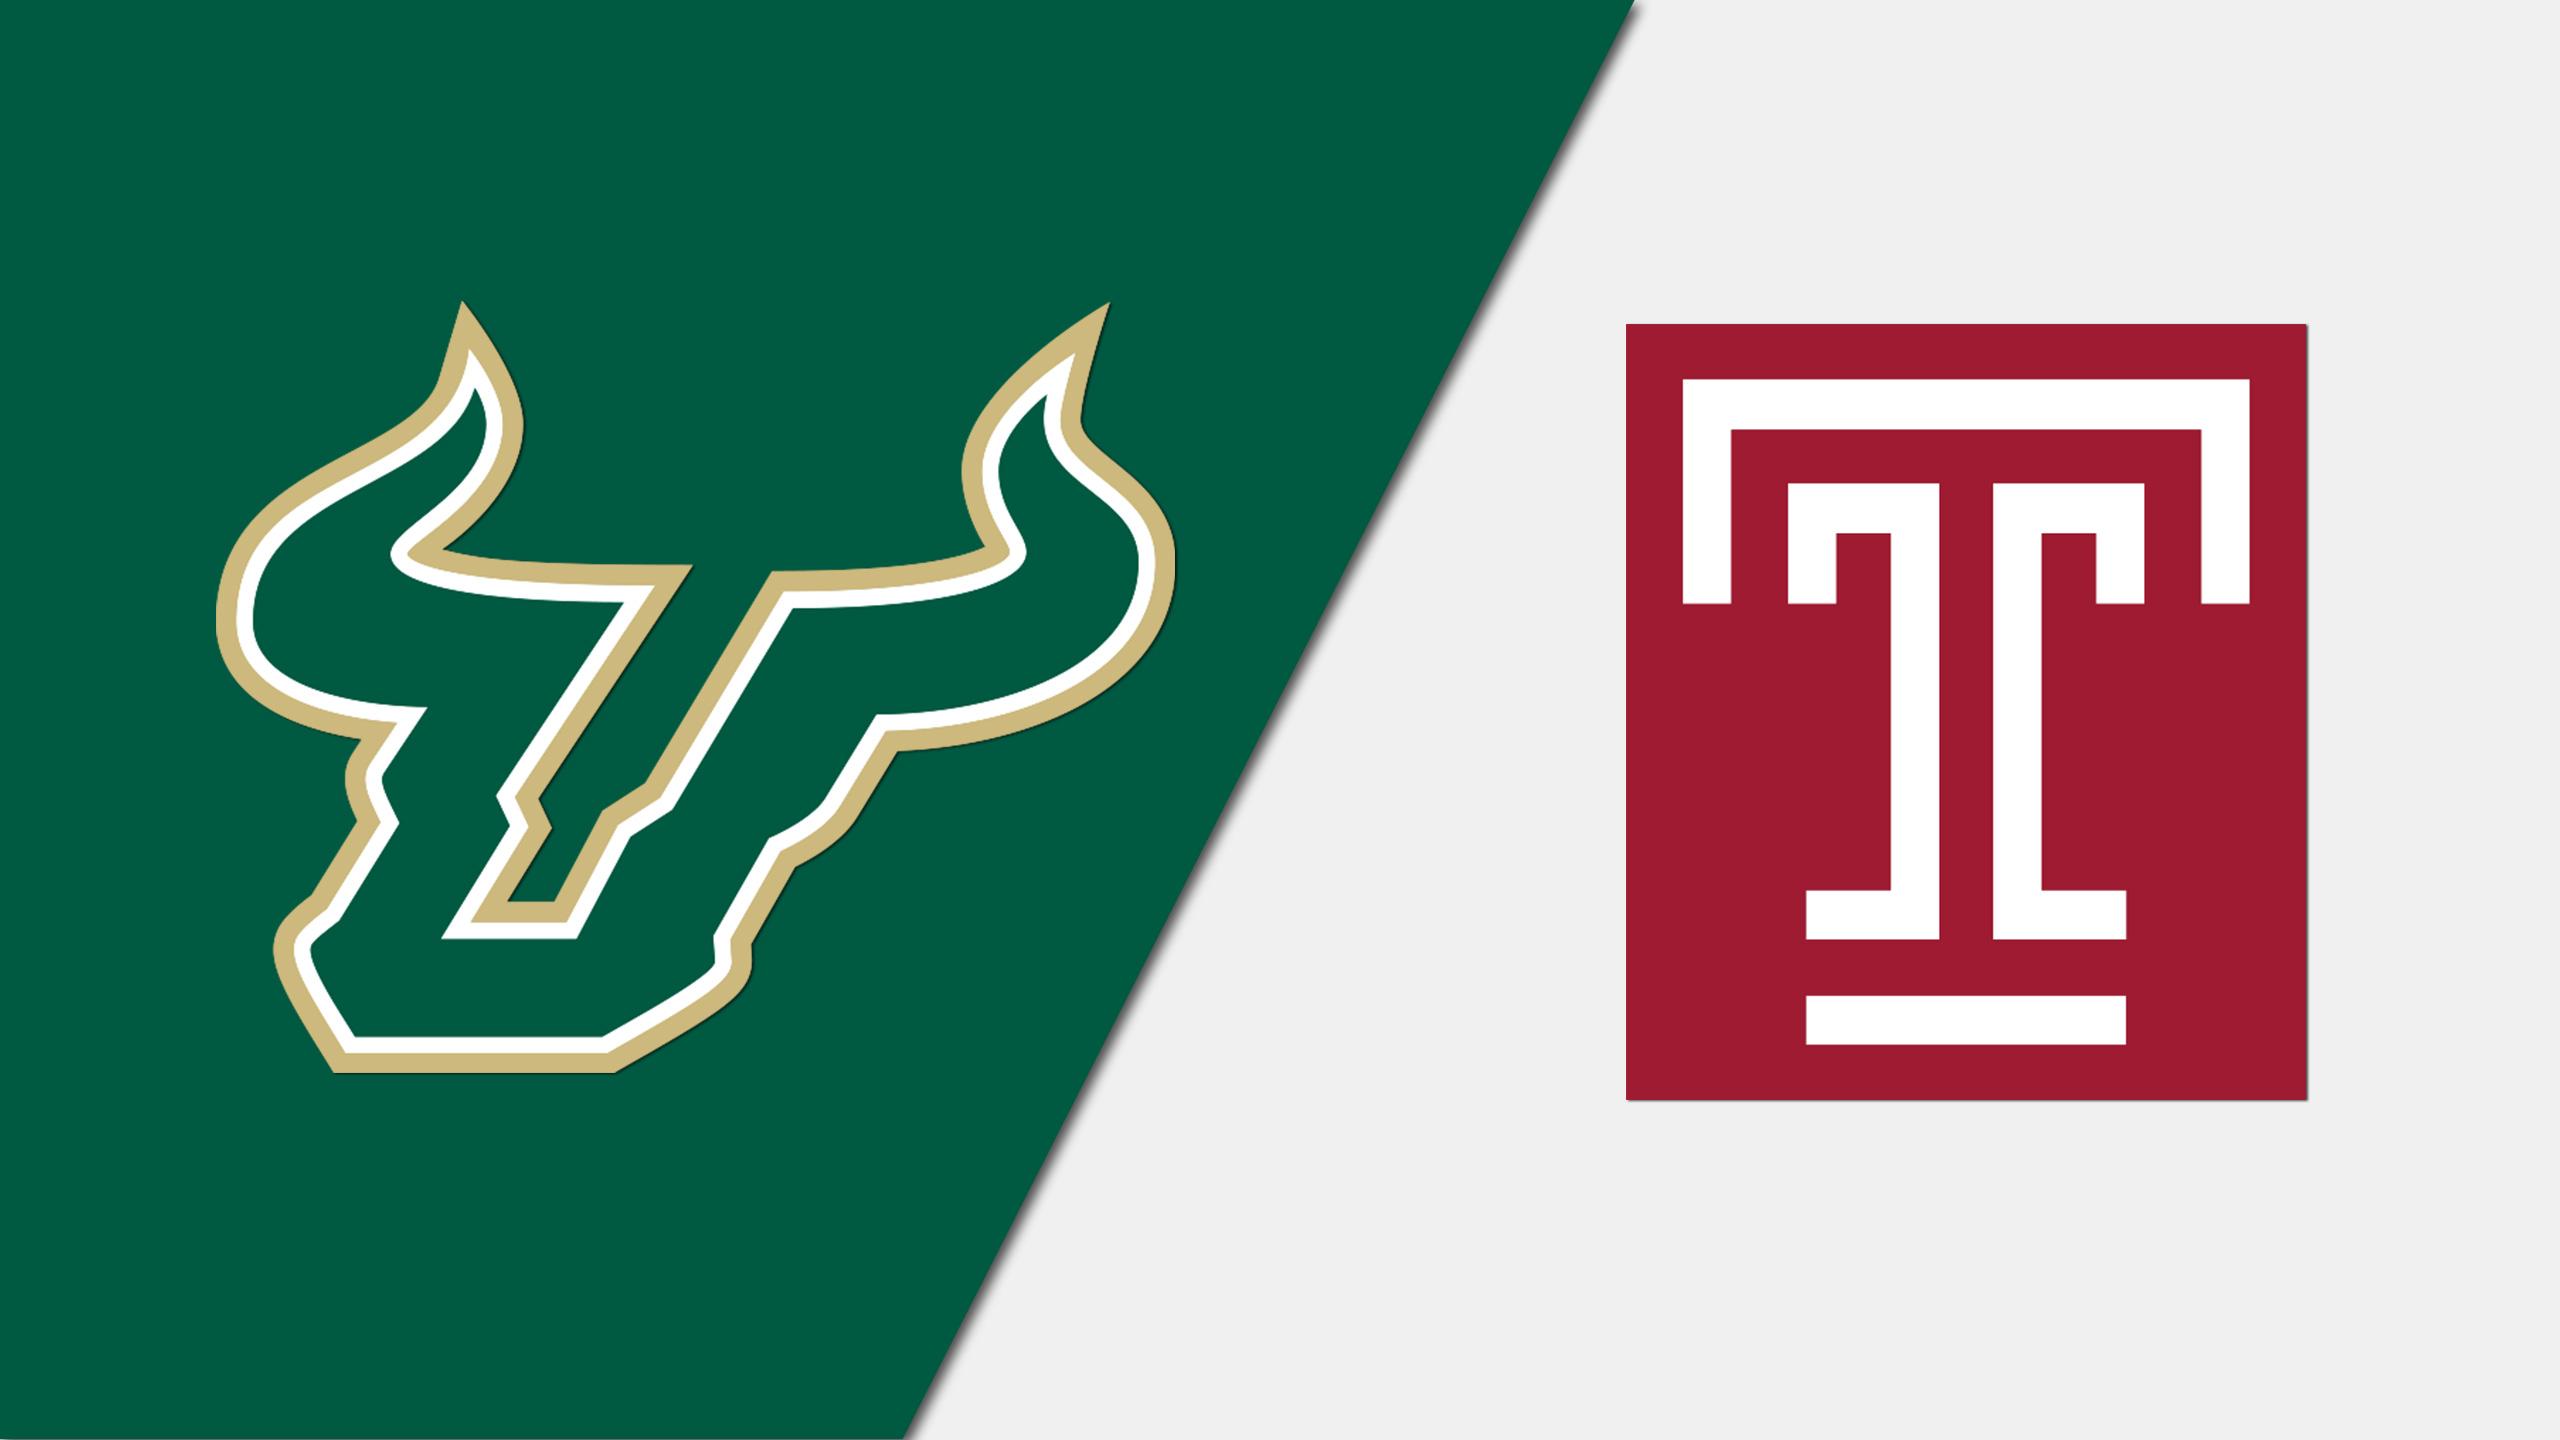 South Florida vs. Temple (Football)